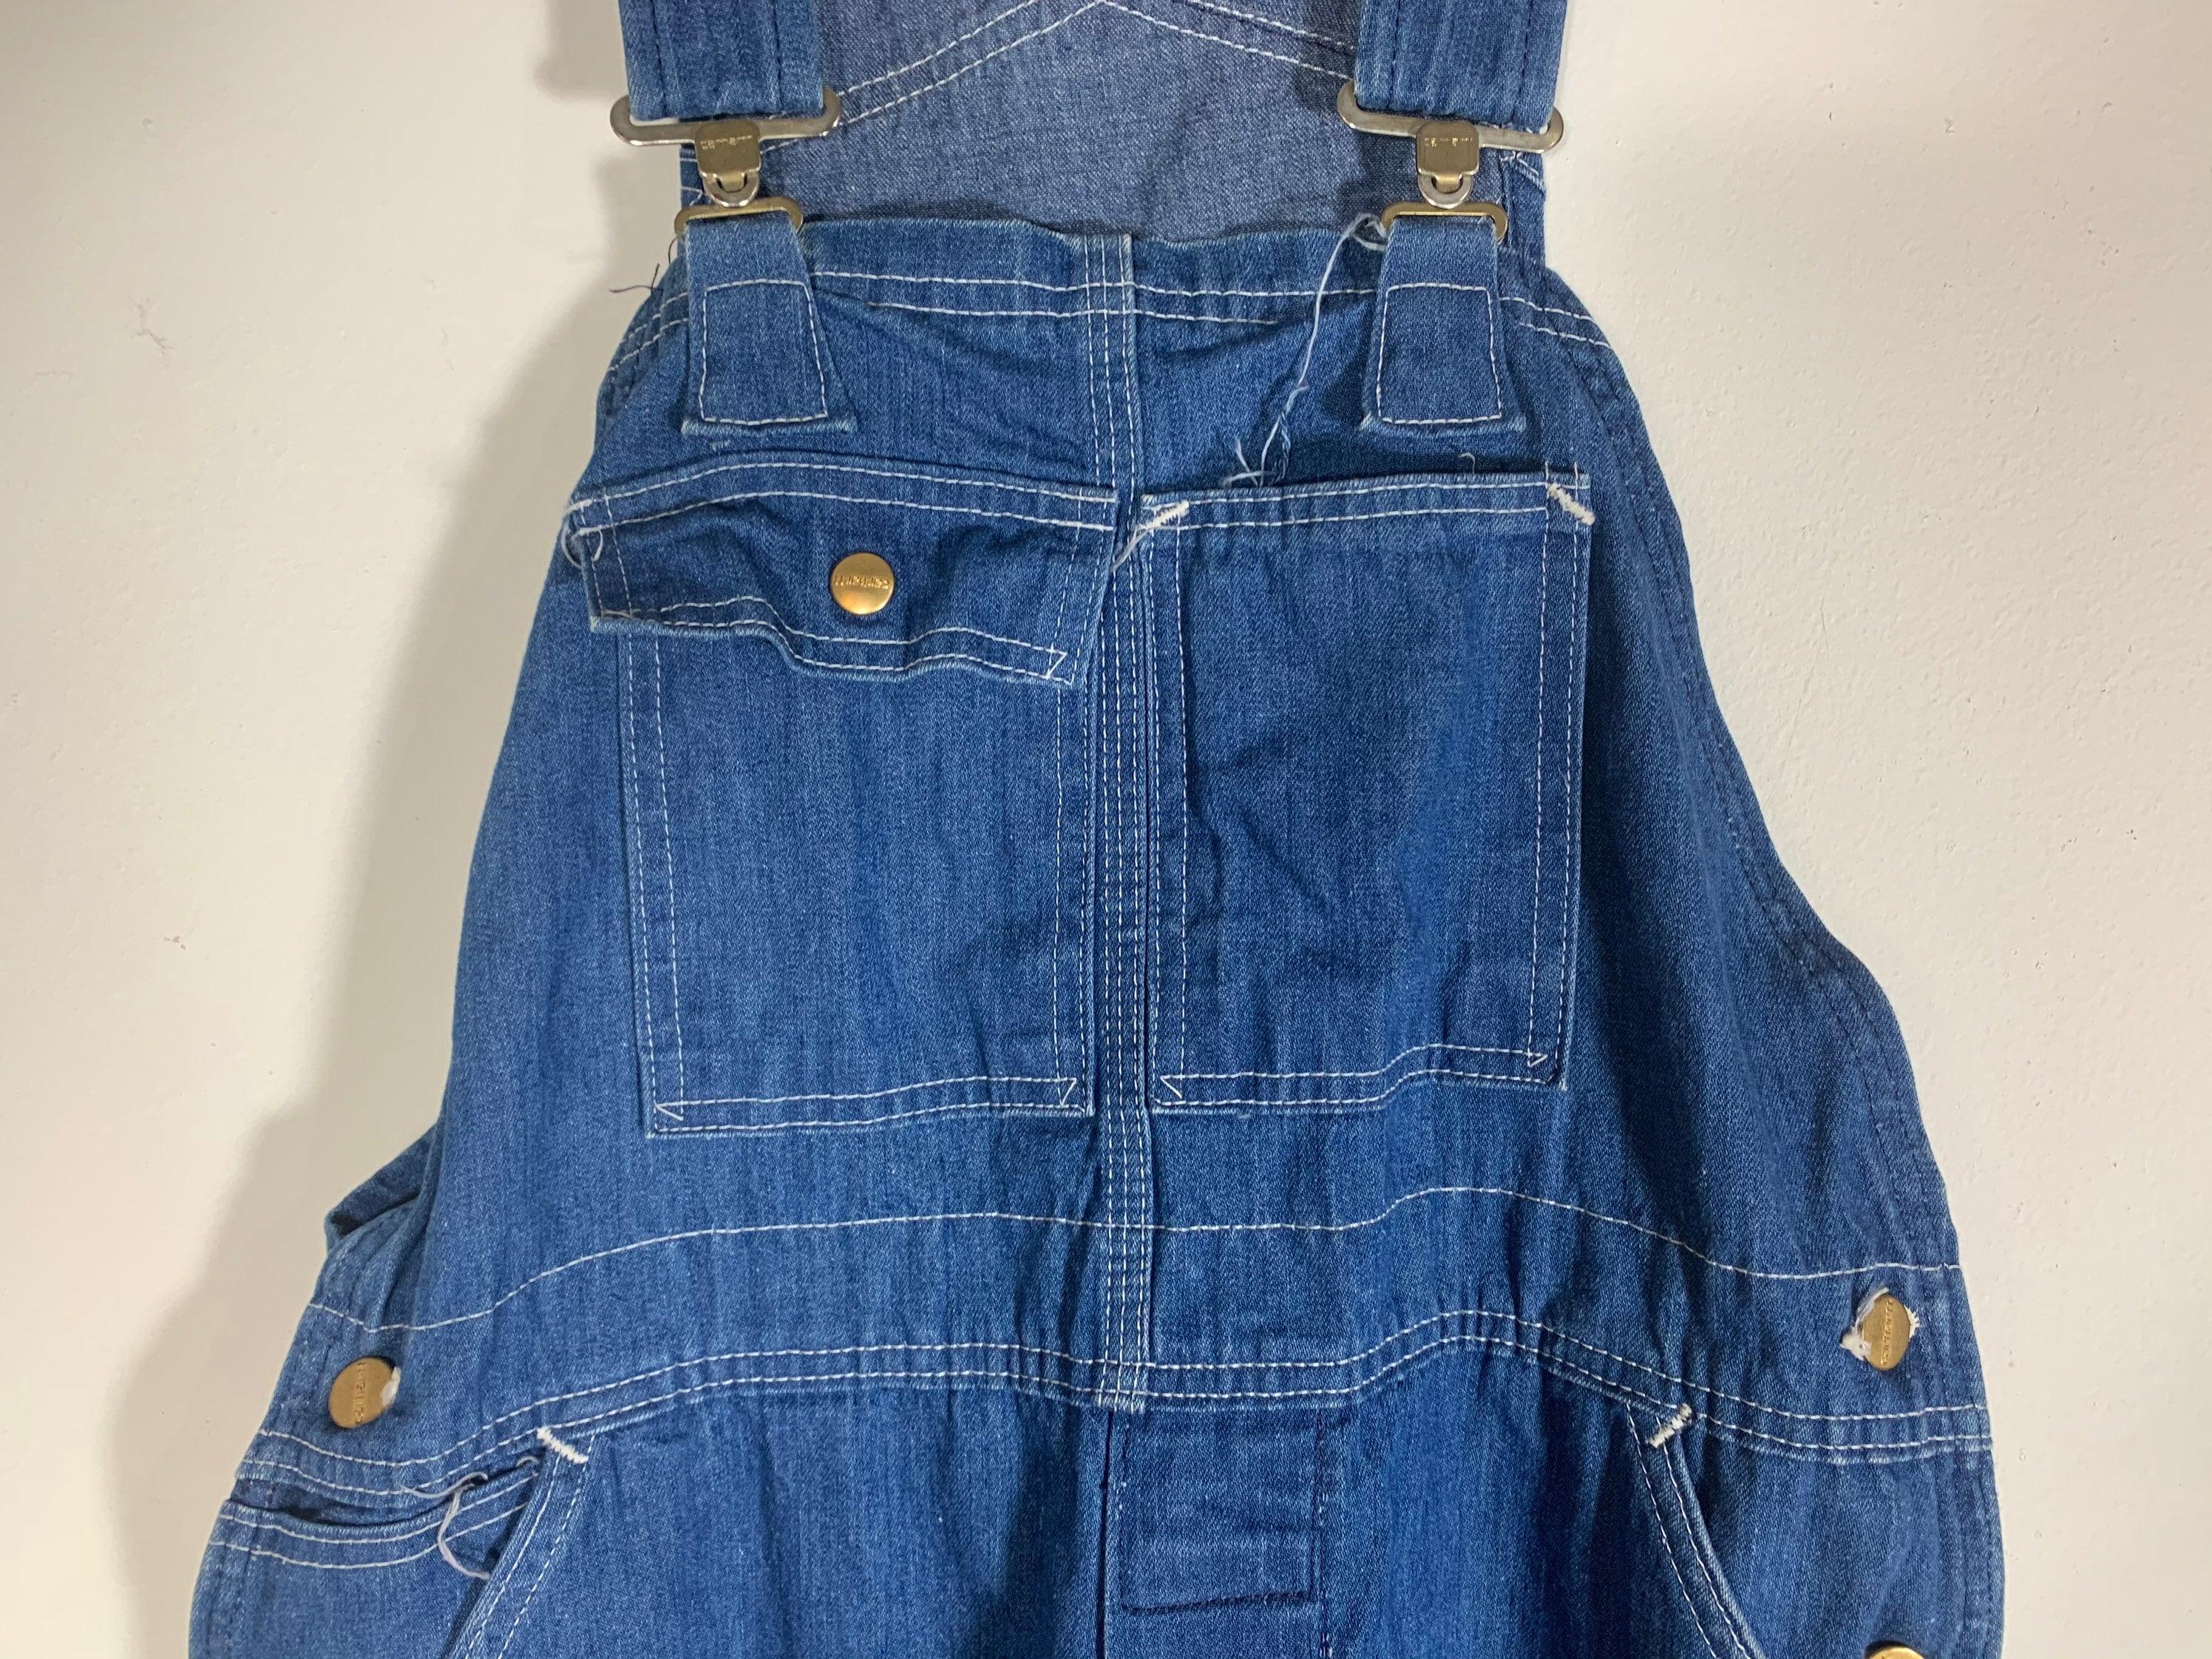 Vintage Overalls & Jumpsuits Vintage 80S 90S Carhartt Denim Jean Coveralls Overalls Broken in Distressed Made Usa 38x30 $0.00 AT vintagedancer.com